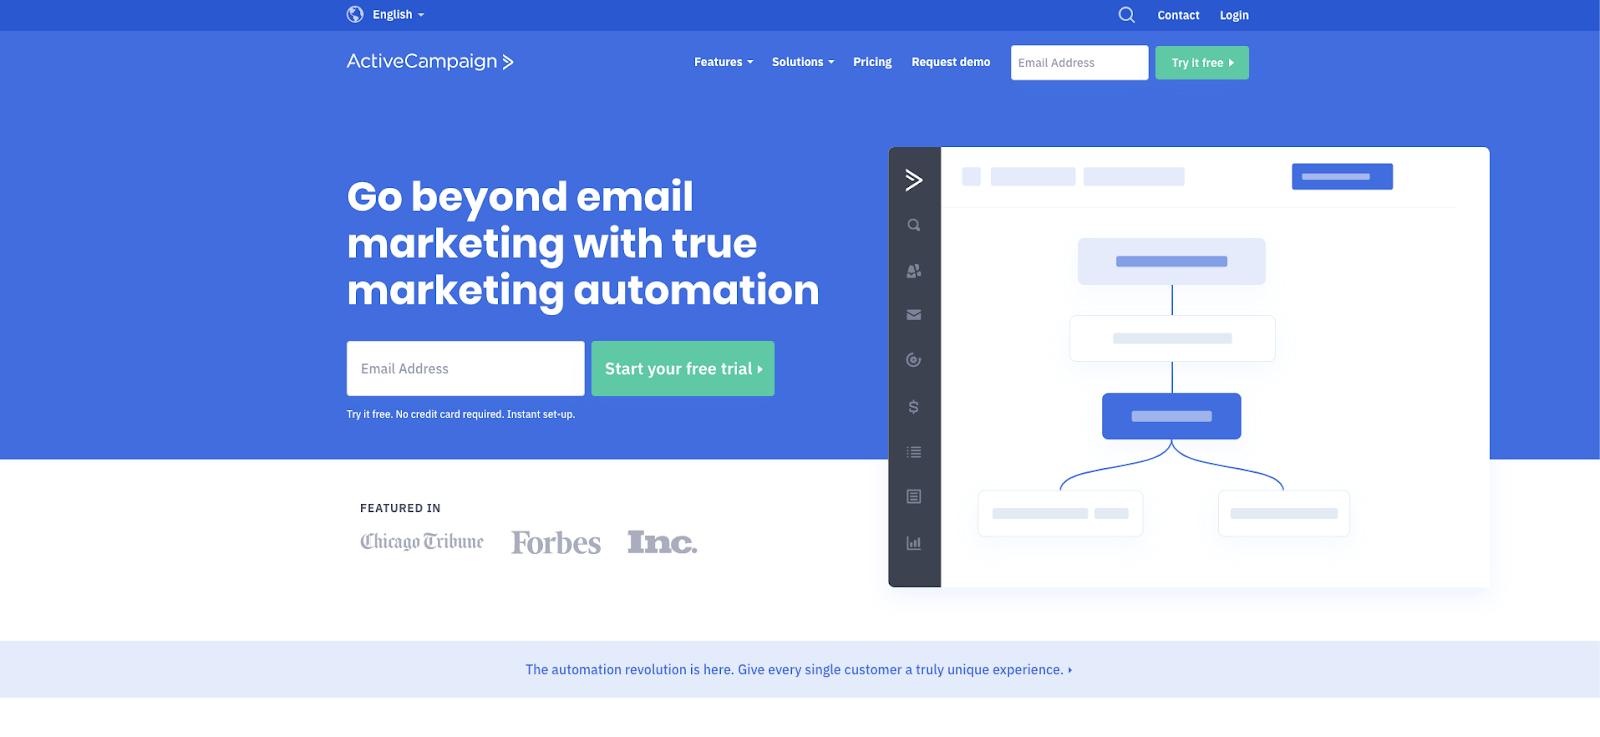 Go beyond e-mail marketing with true marketing automation - Website screenshot.